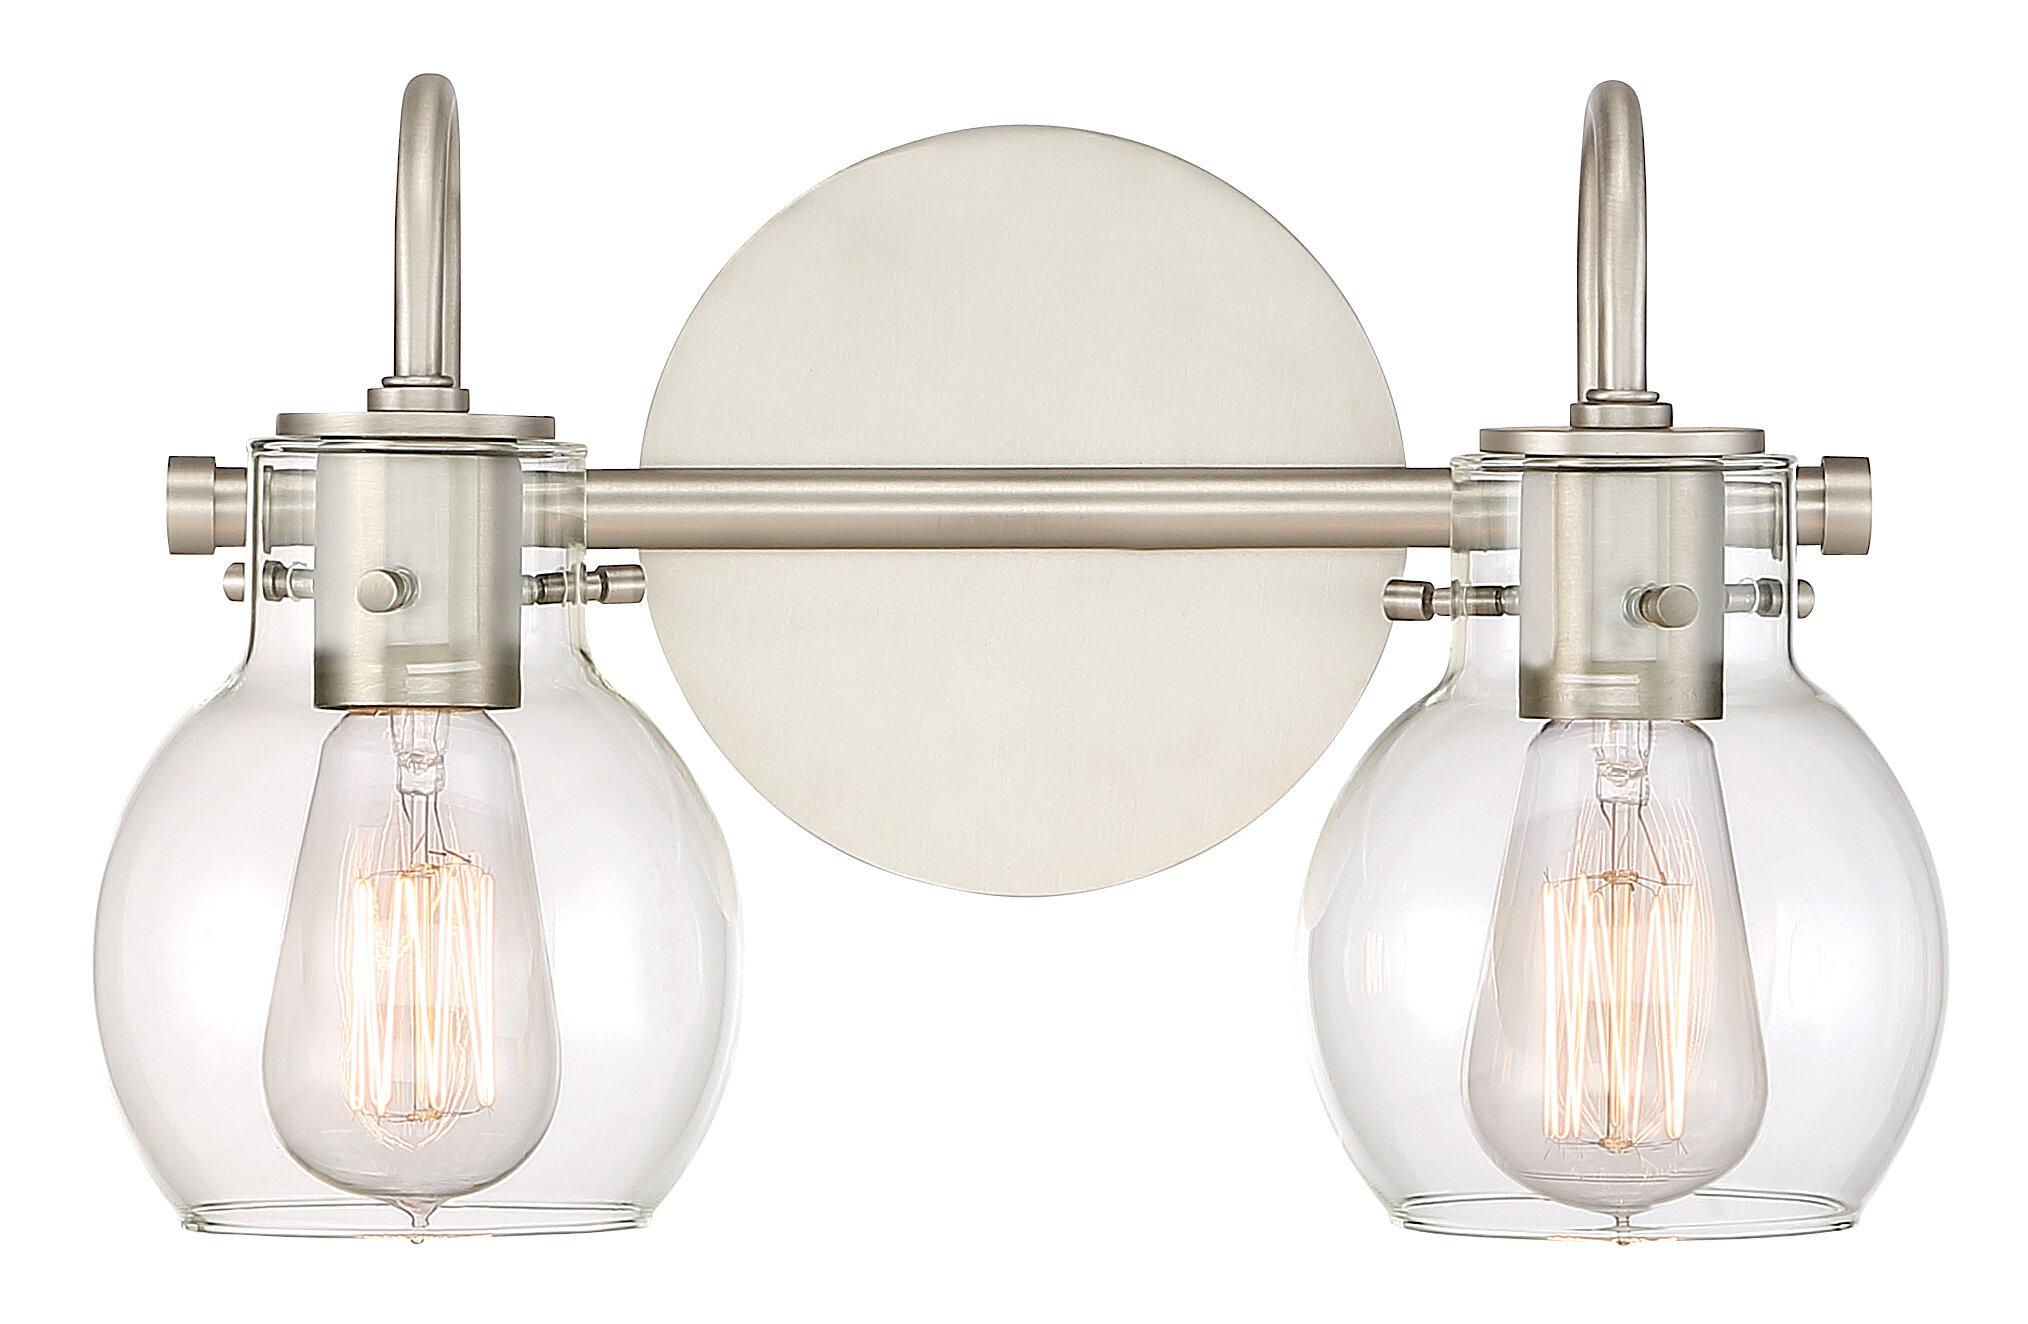 new product 1c3ef 98f15 Massingham 2-Light Vanity Light